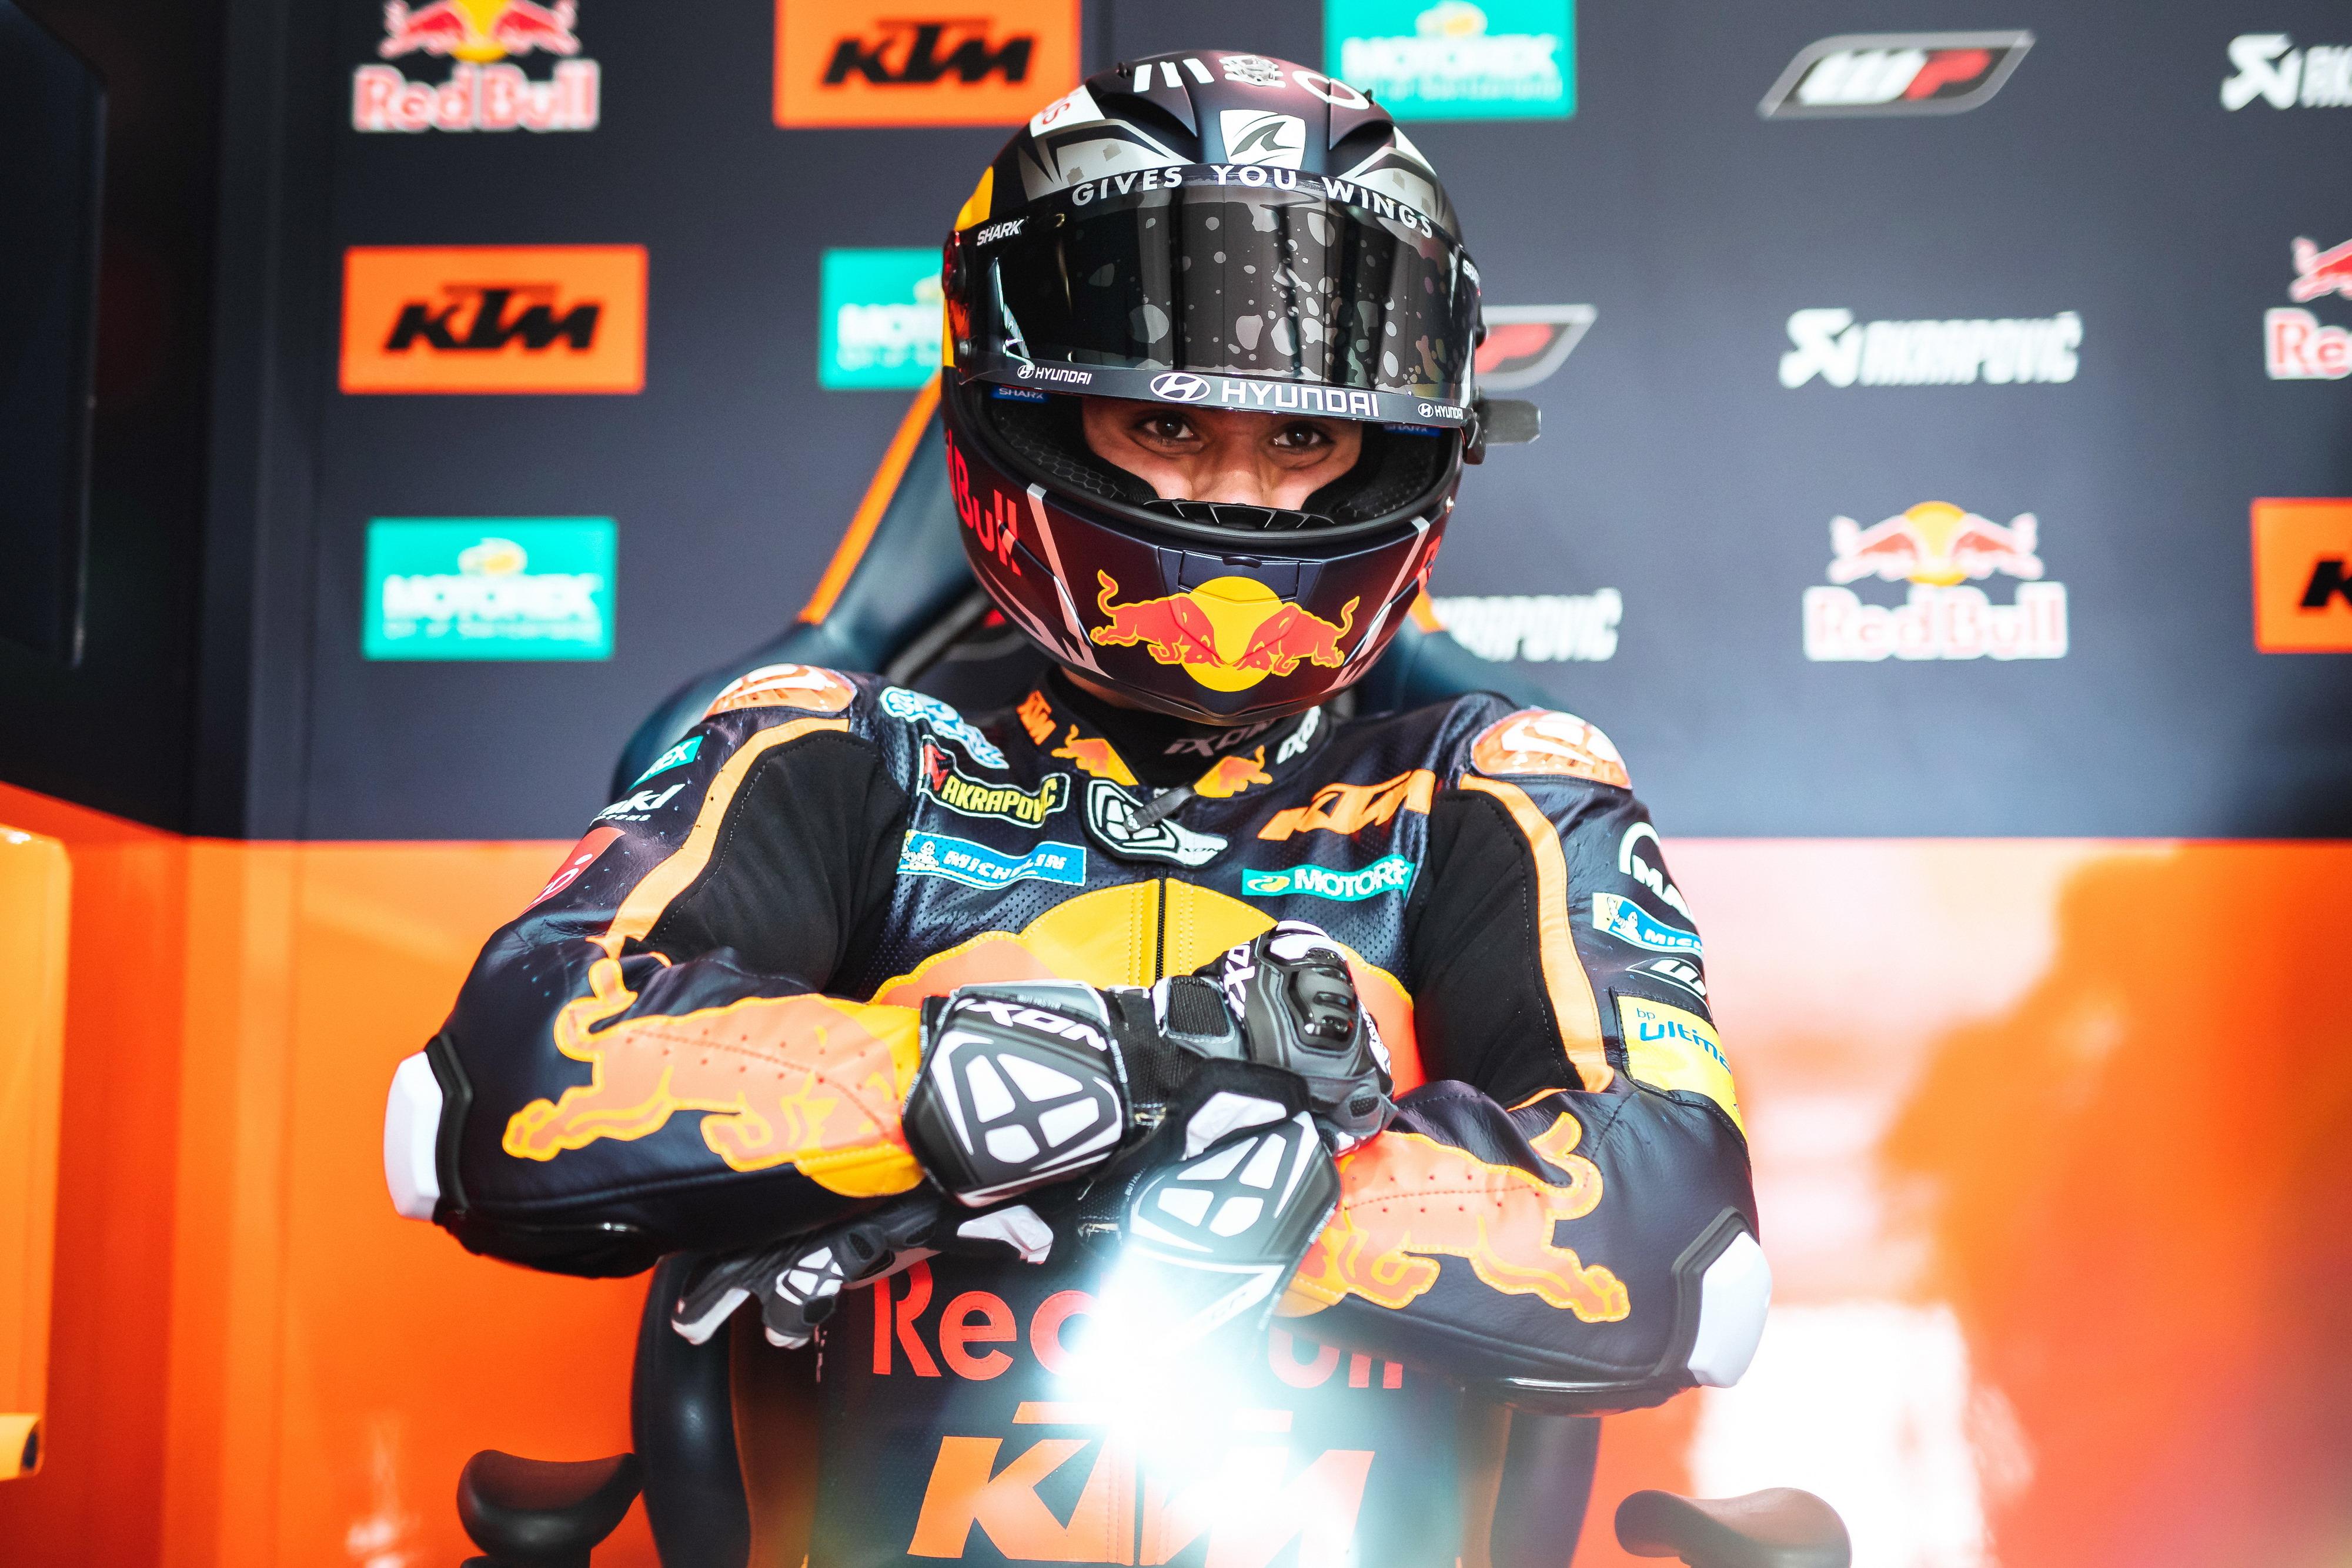 2021 MotoGP:卡塔��季前�y�、KTM �S�篇(2)